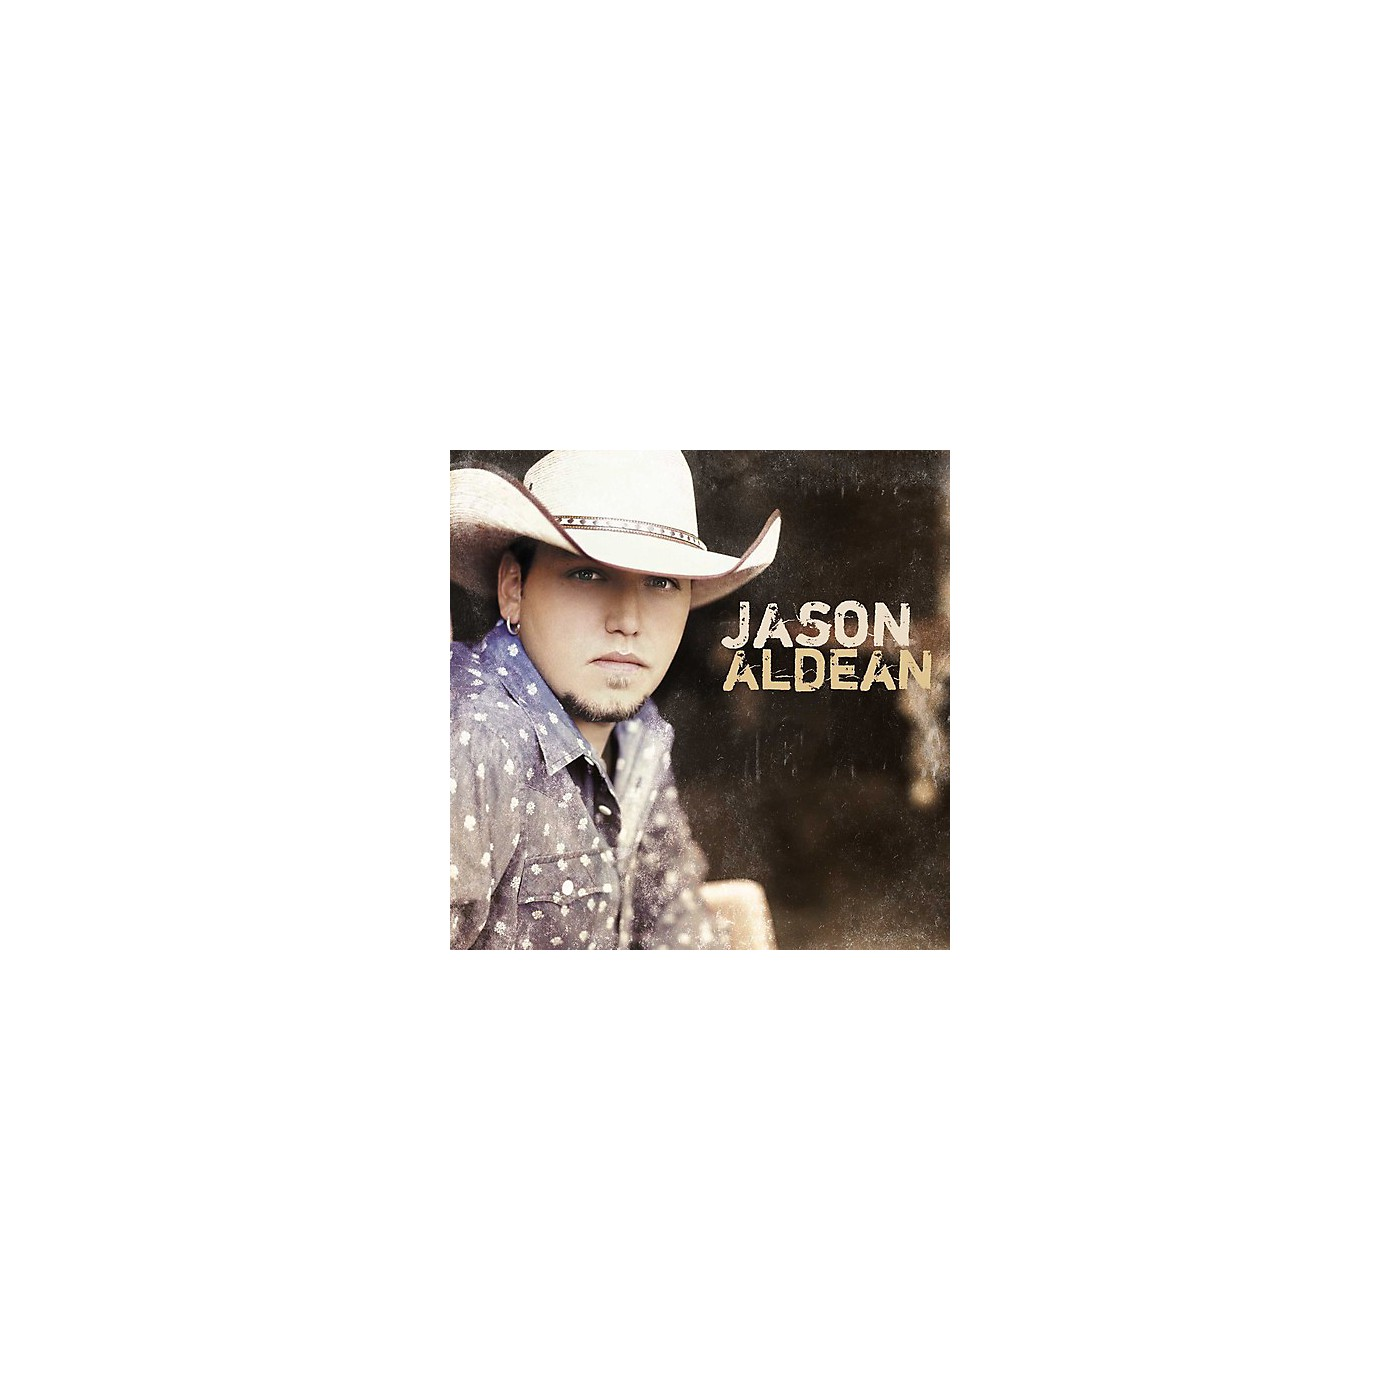 Alliance Jason Aldean - Jason Aldean (CD) thumbnail